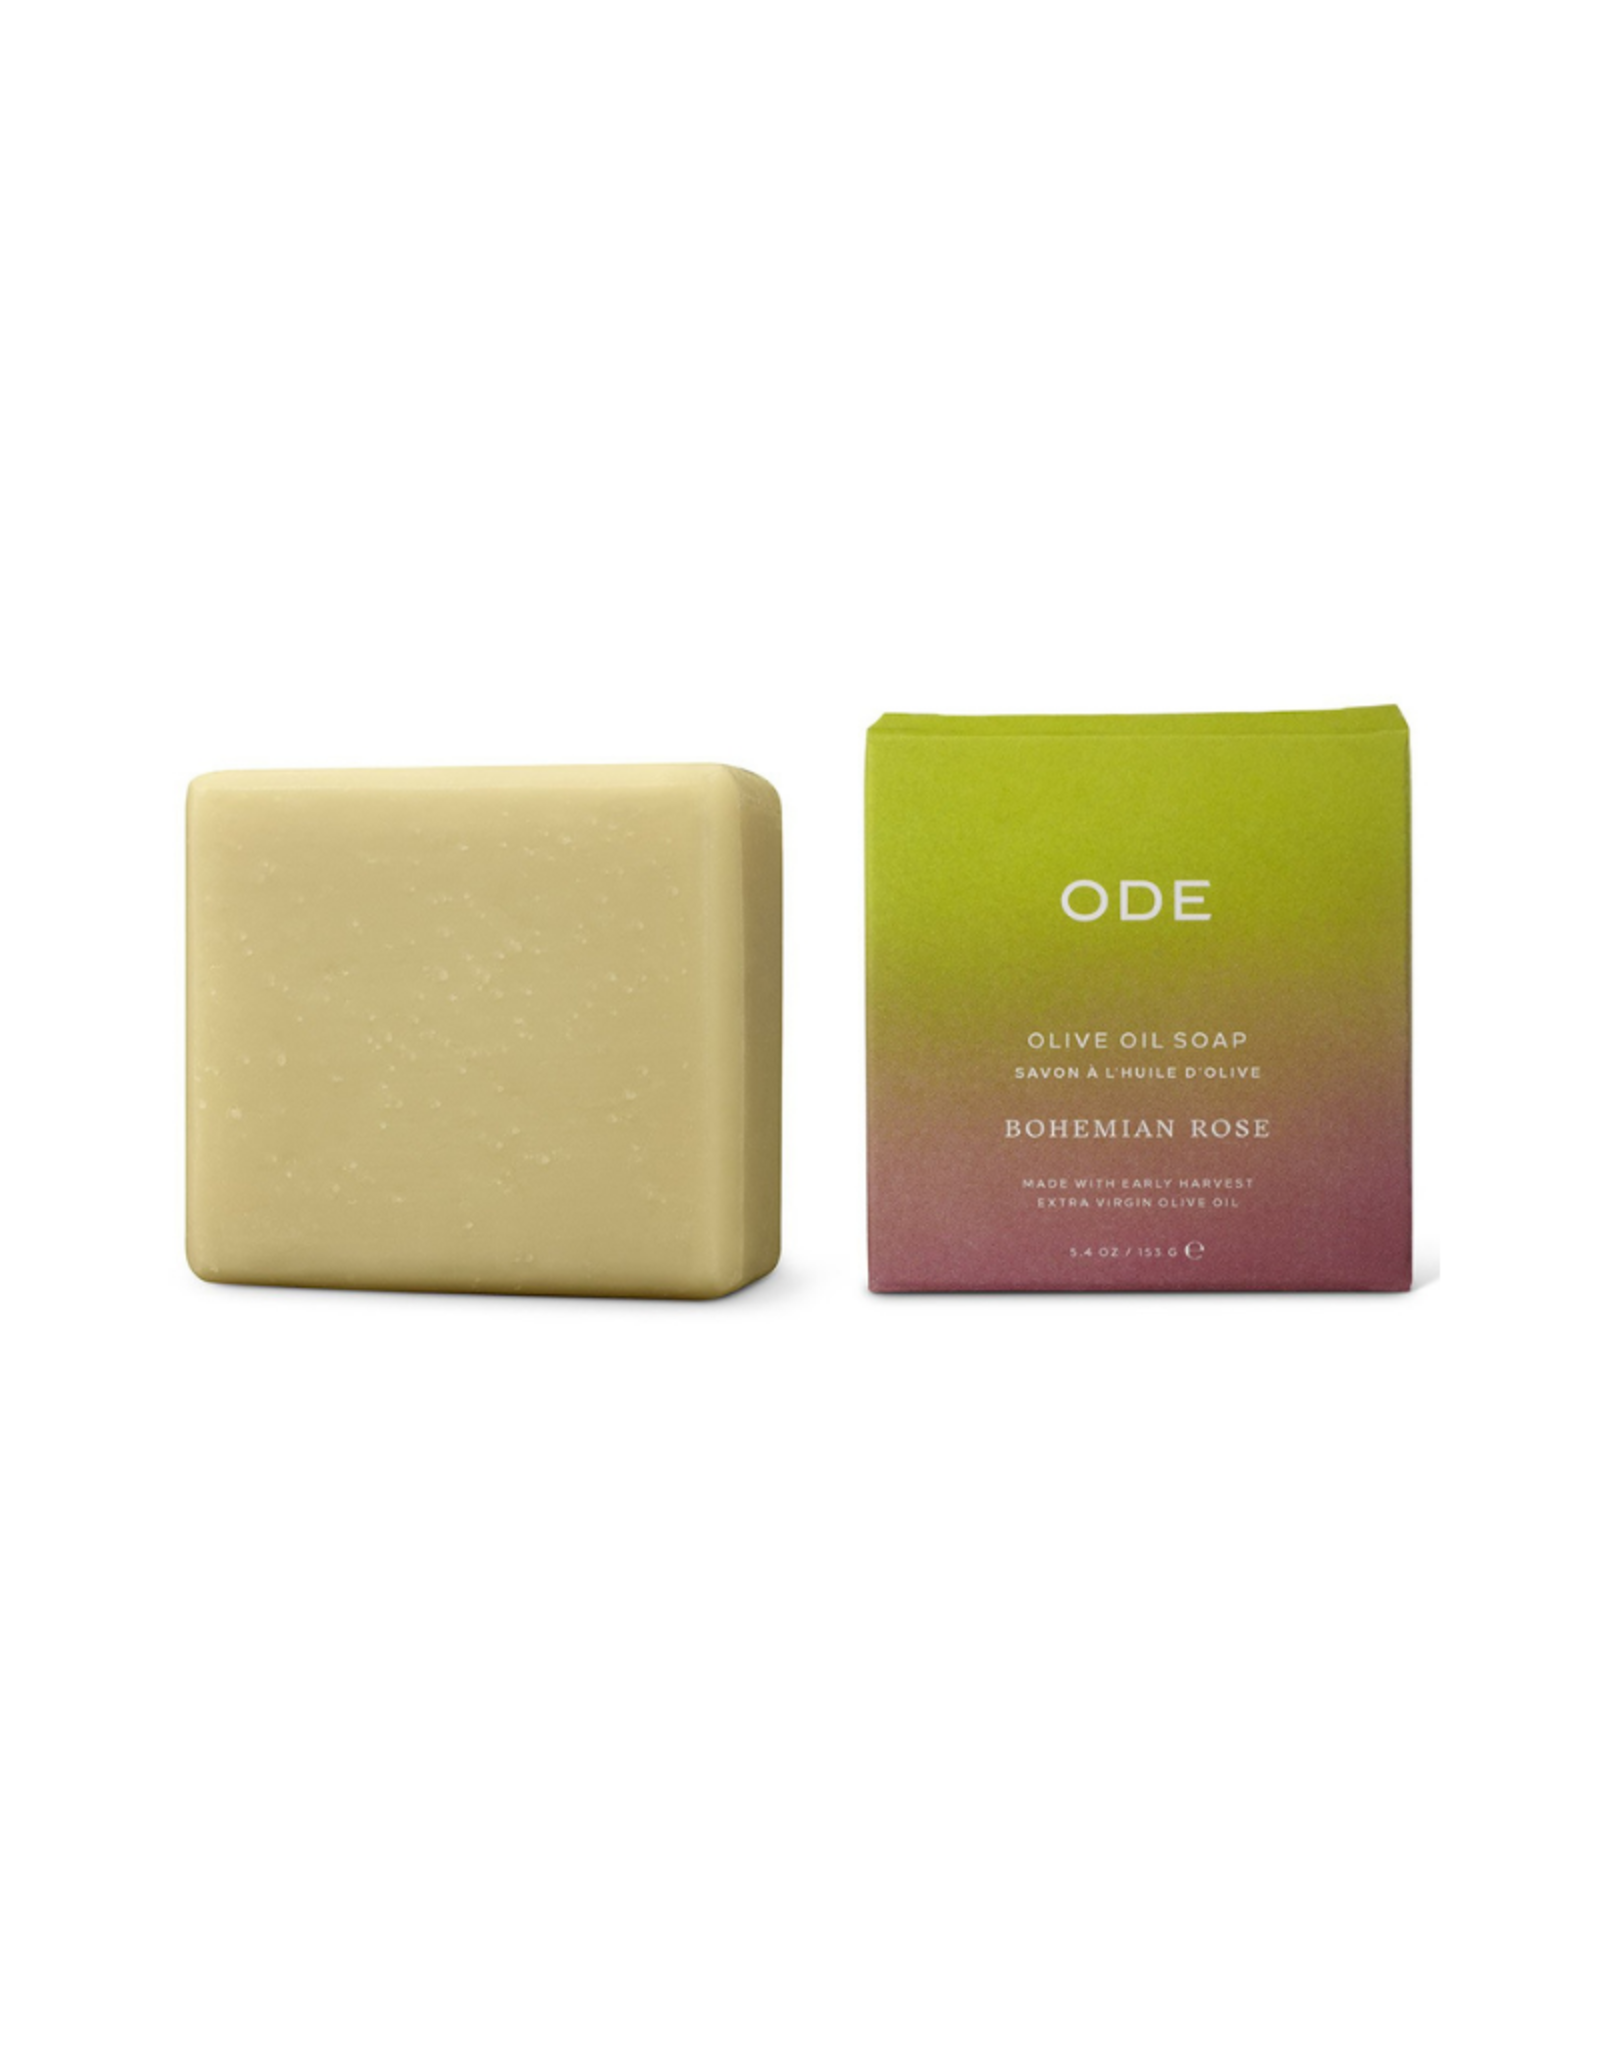 ODE ODE Bohemian Rose Olive Oil Soap